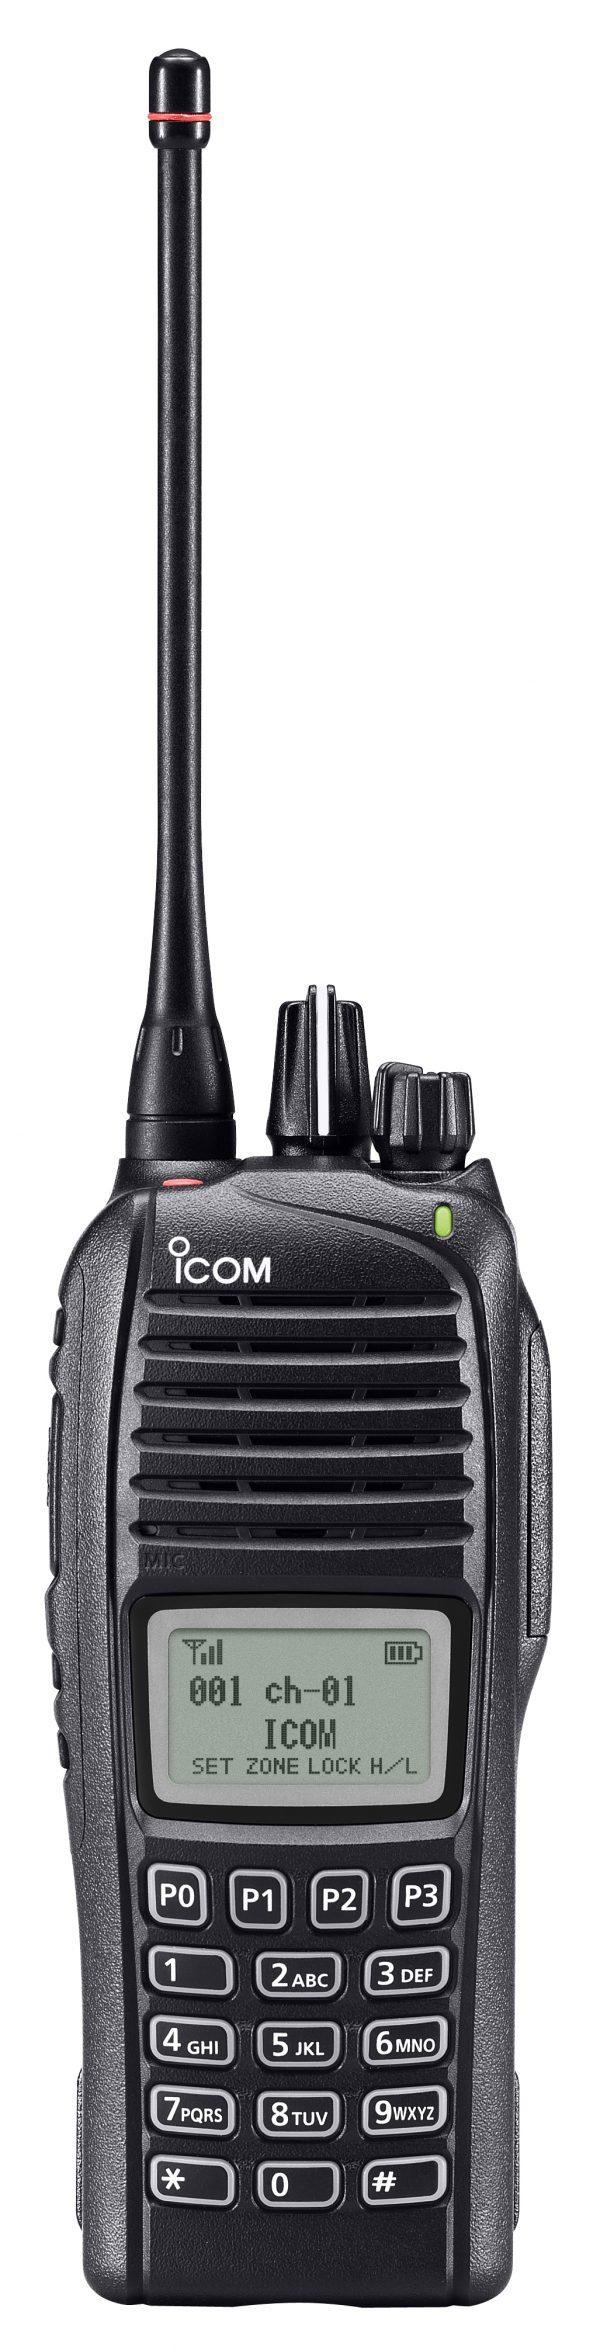 IC-F4262DT radio